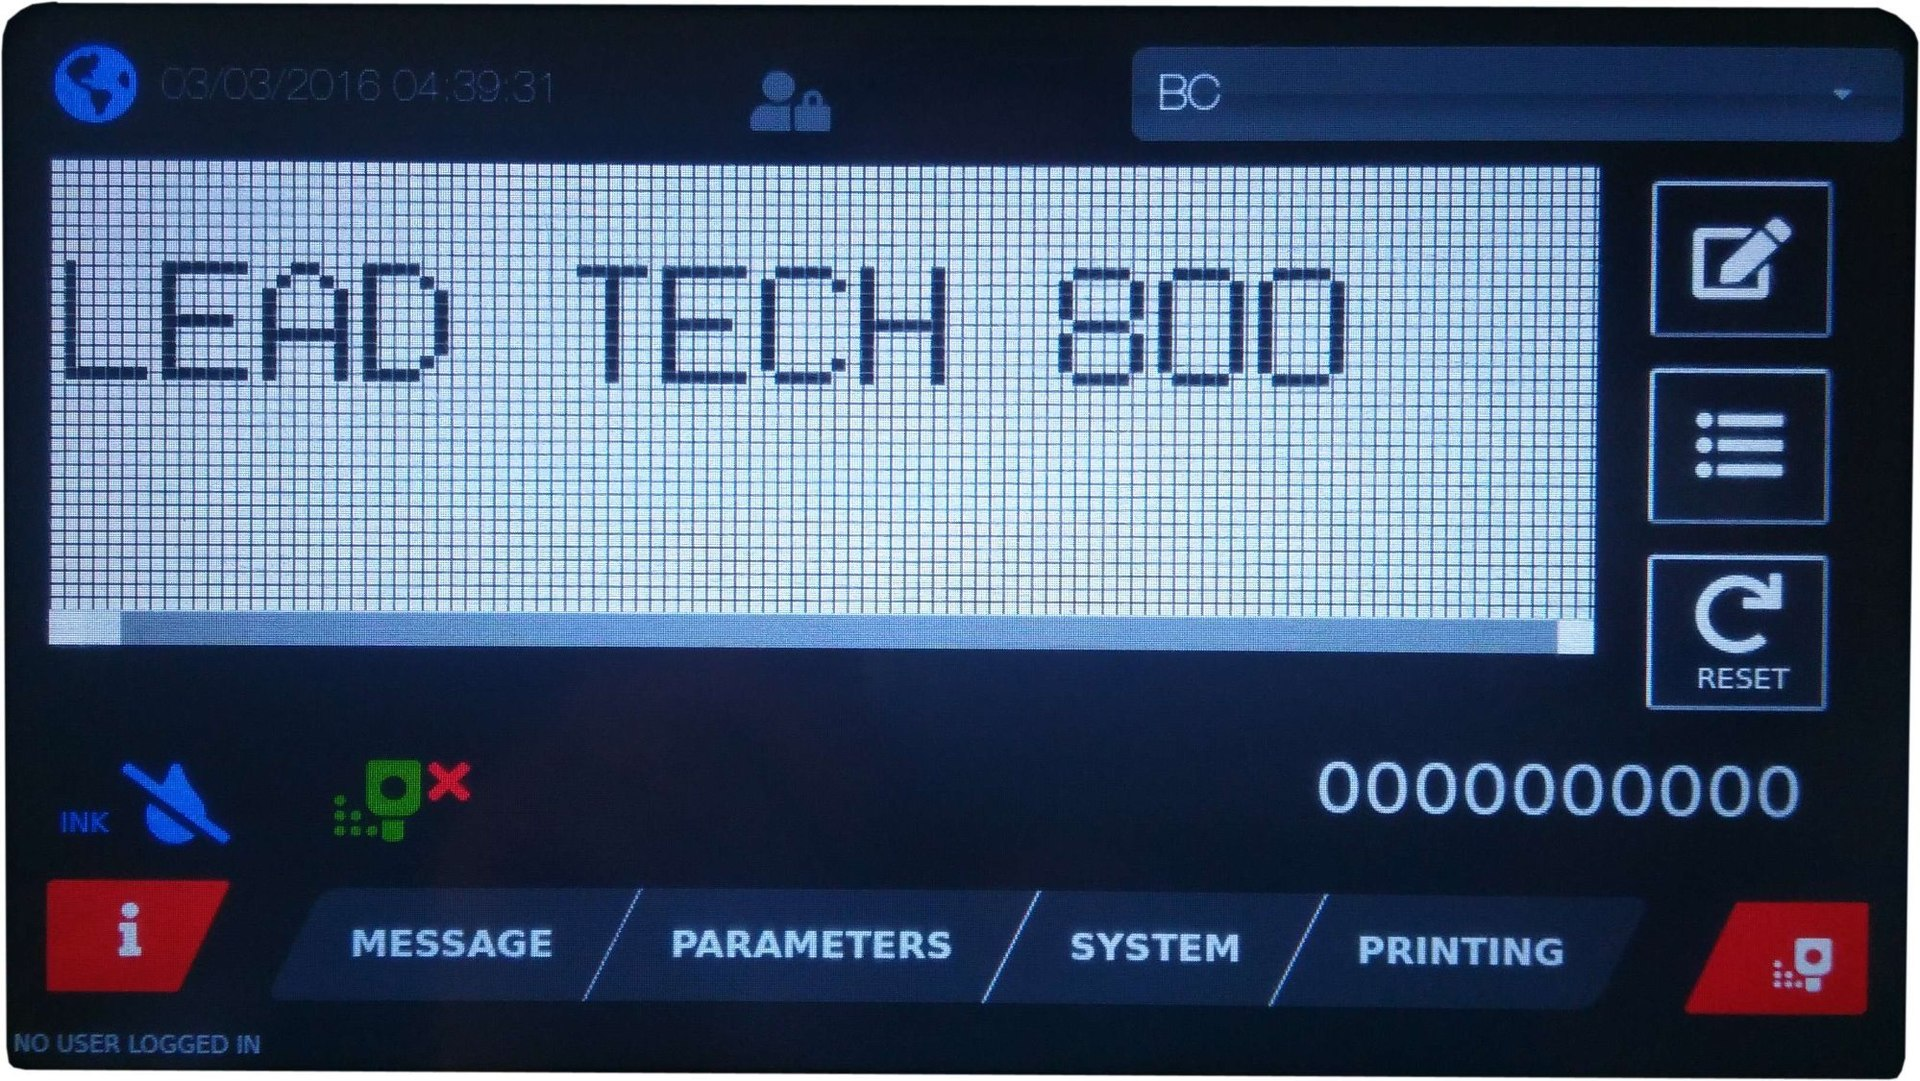 Lead Tech Cij Digital Printer for Cable Printing Lt800